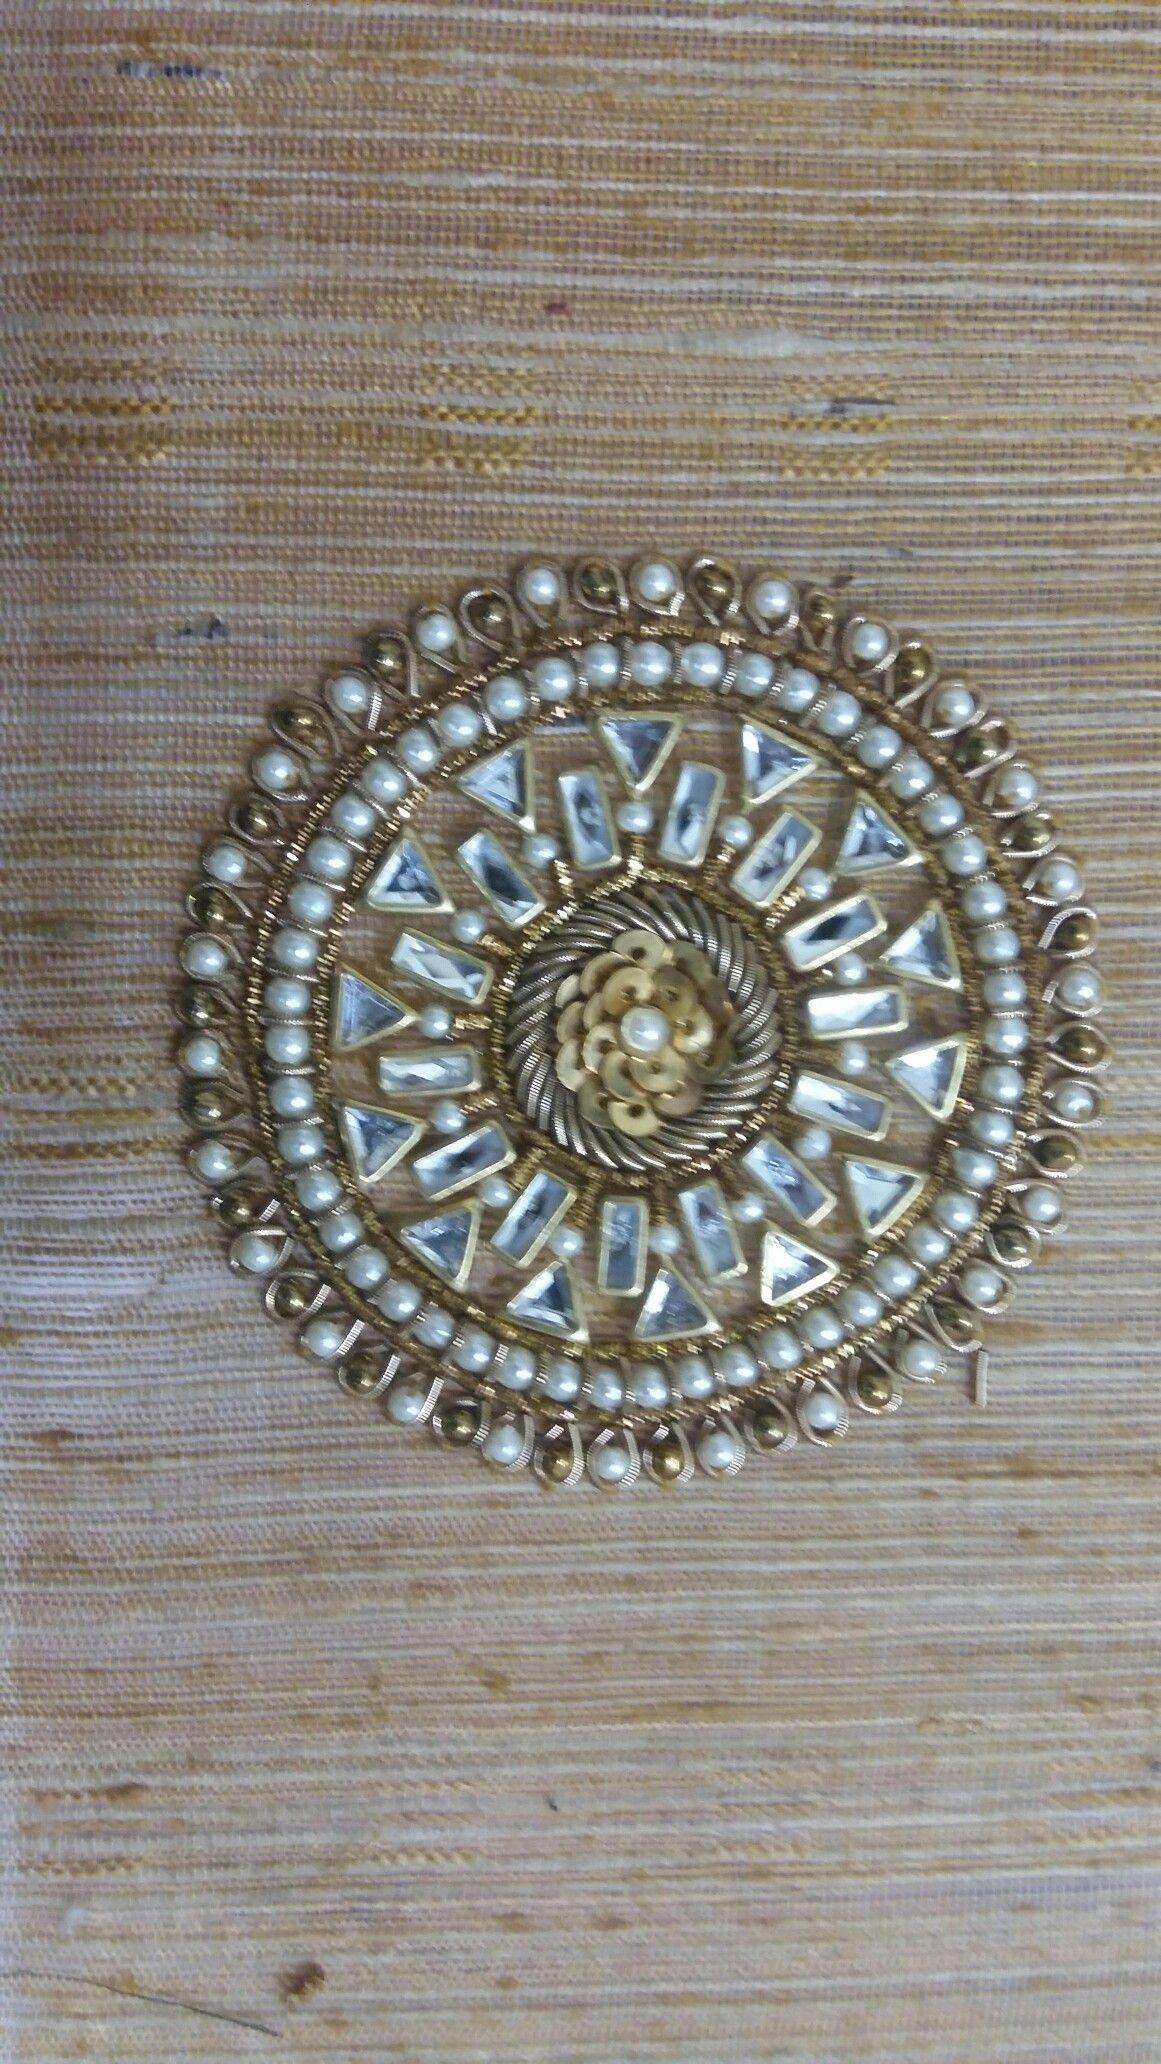 Pin by ankitapaliwalgmail ankitapaliwalgmail on embroidery